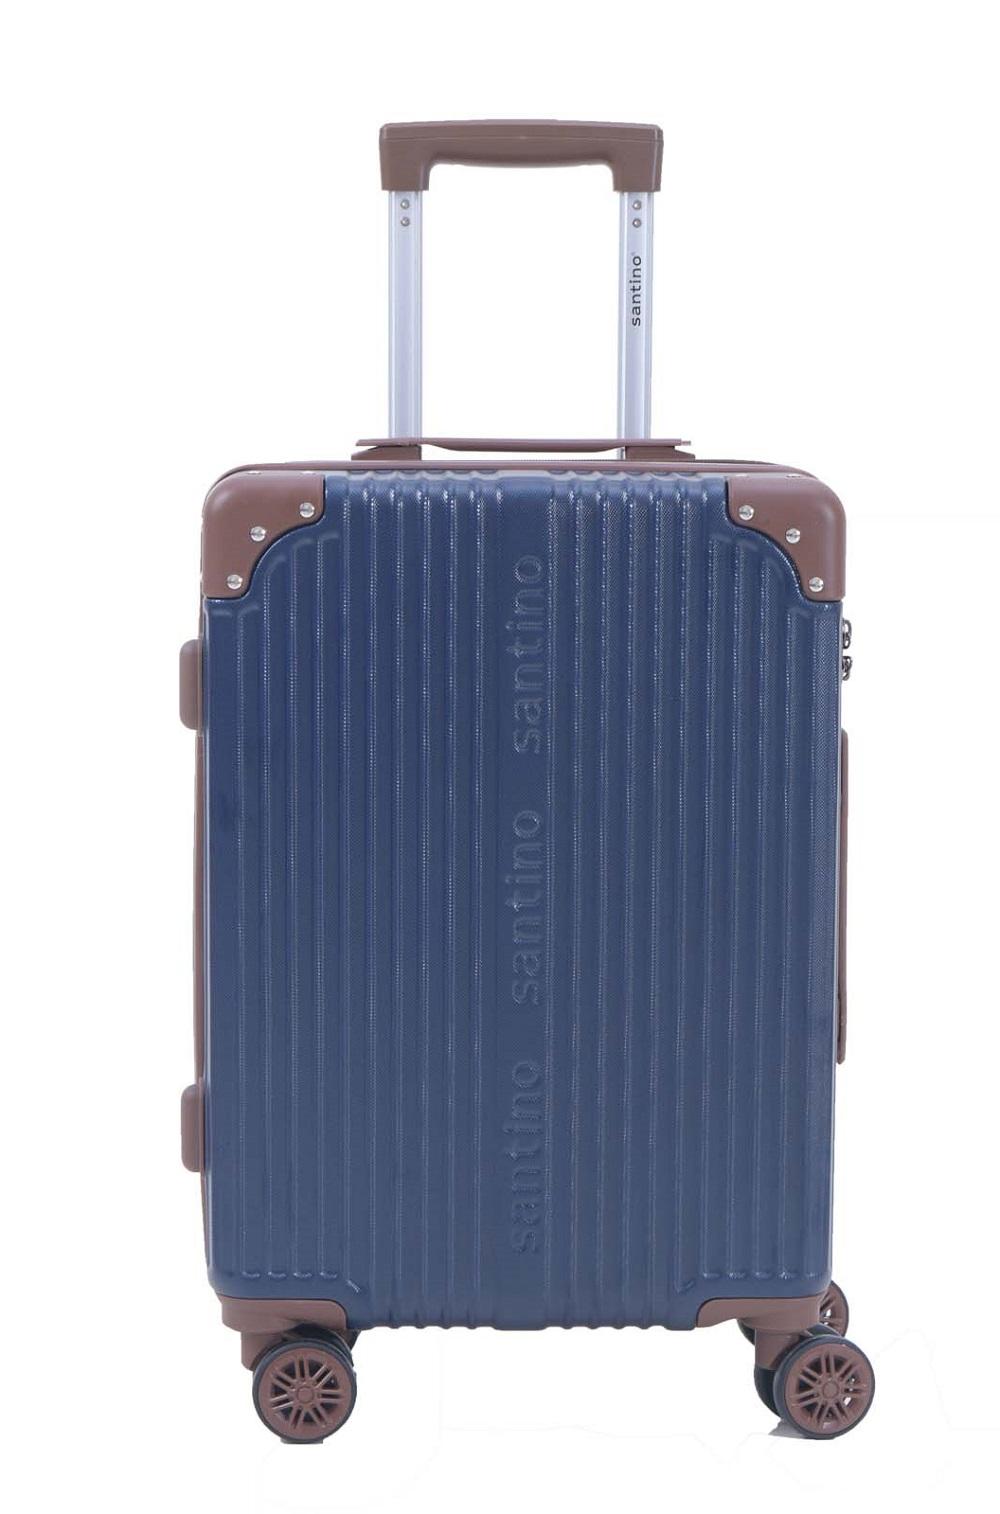 Mala de Viagem Santino c/ Cadeado TSA - Palazzio